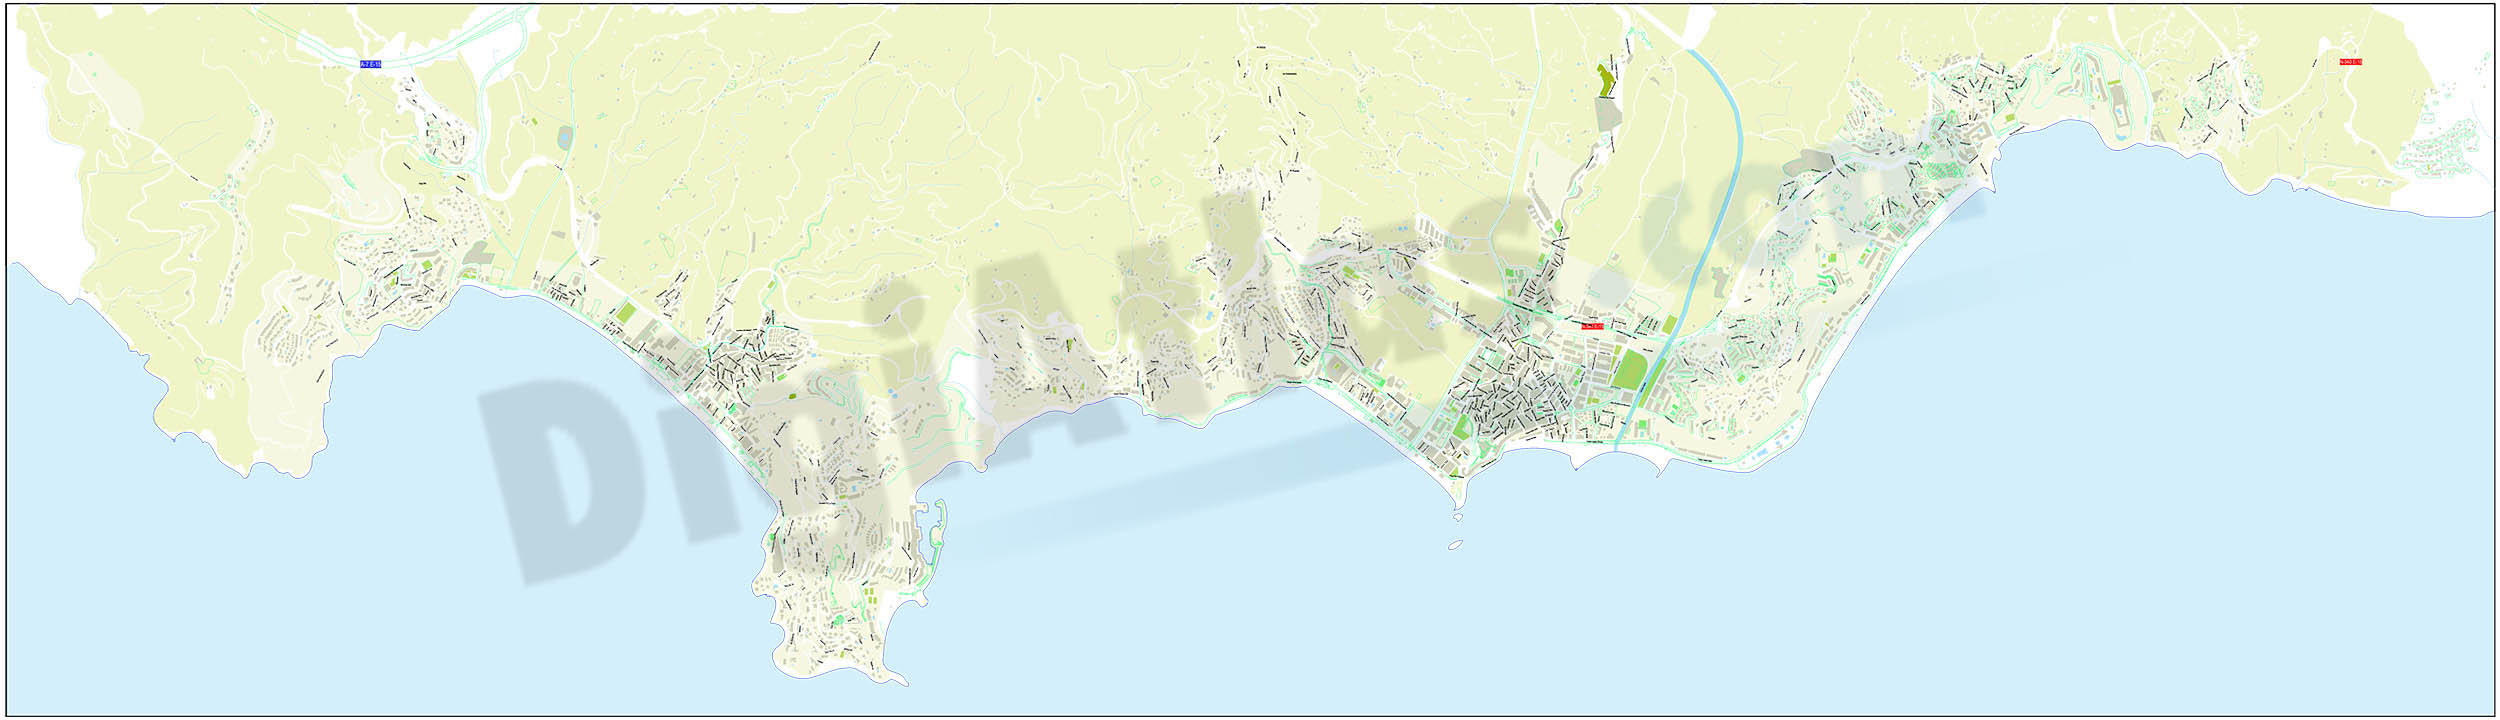 Almuñecar - city map